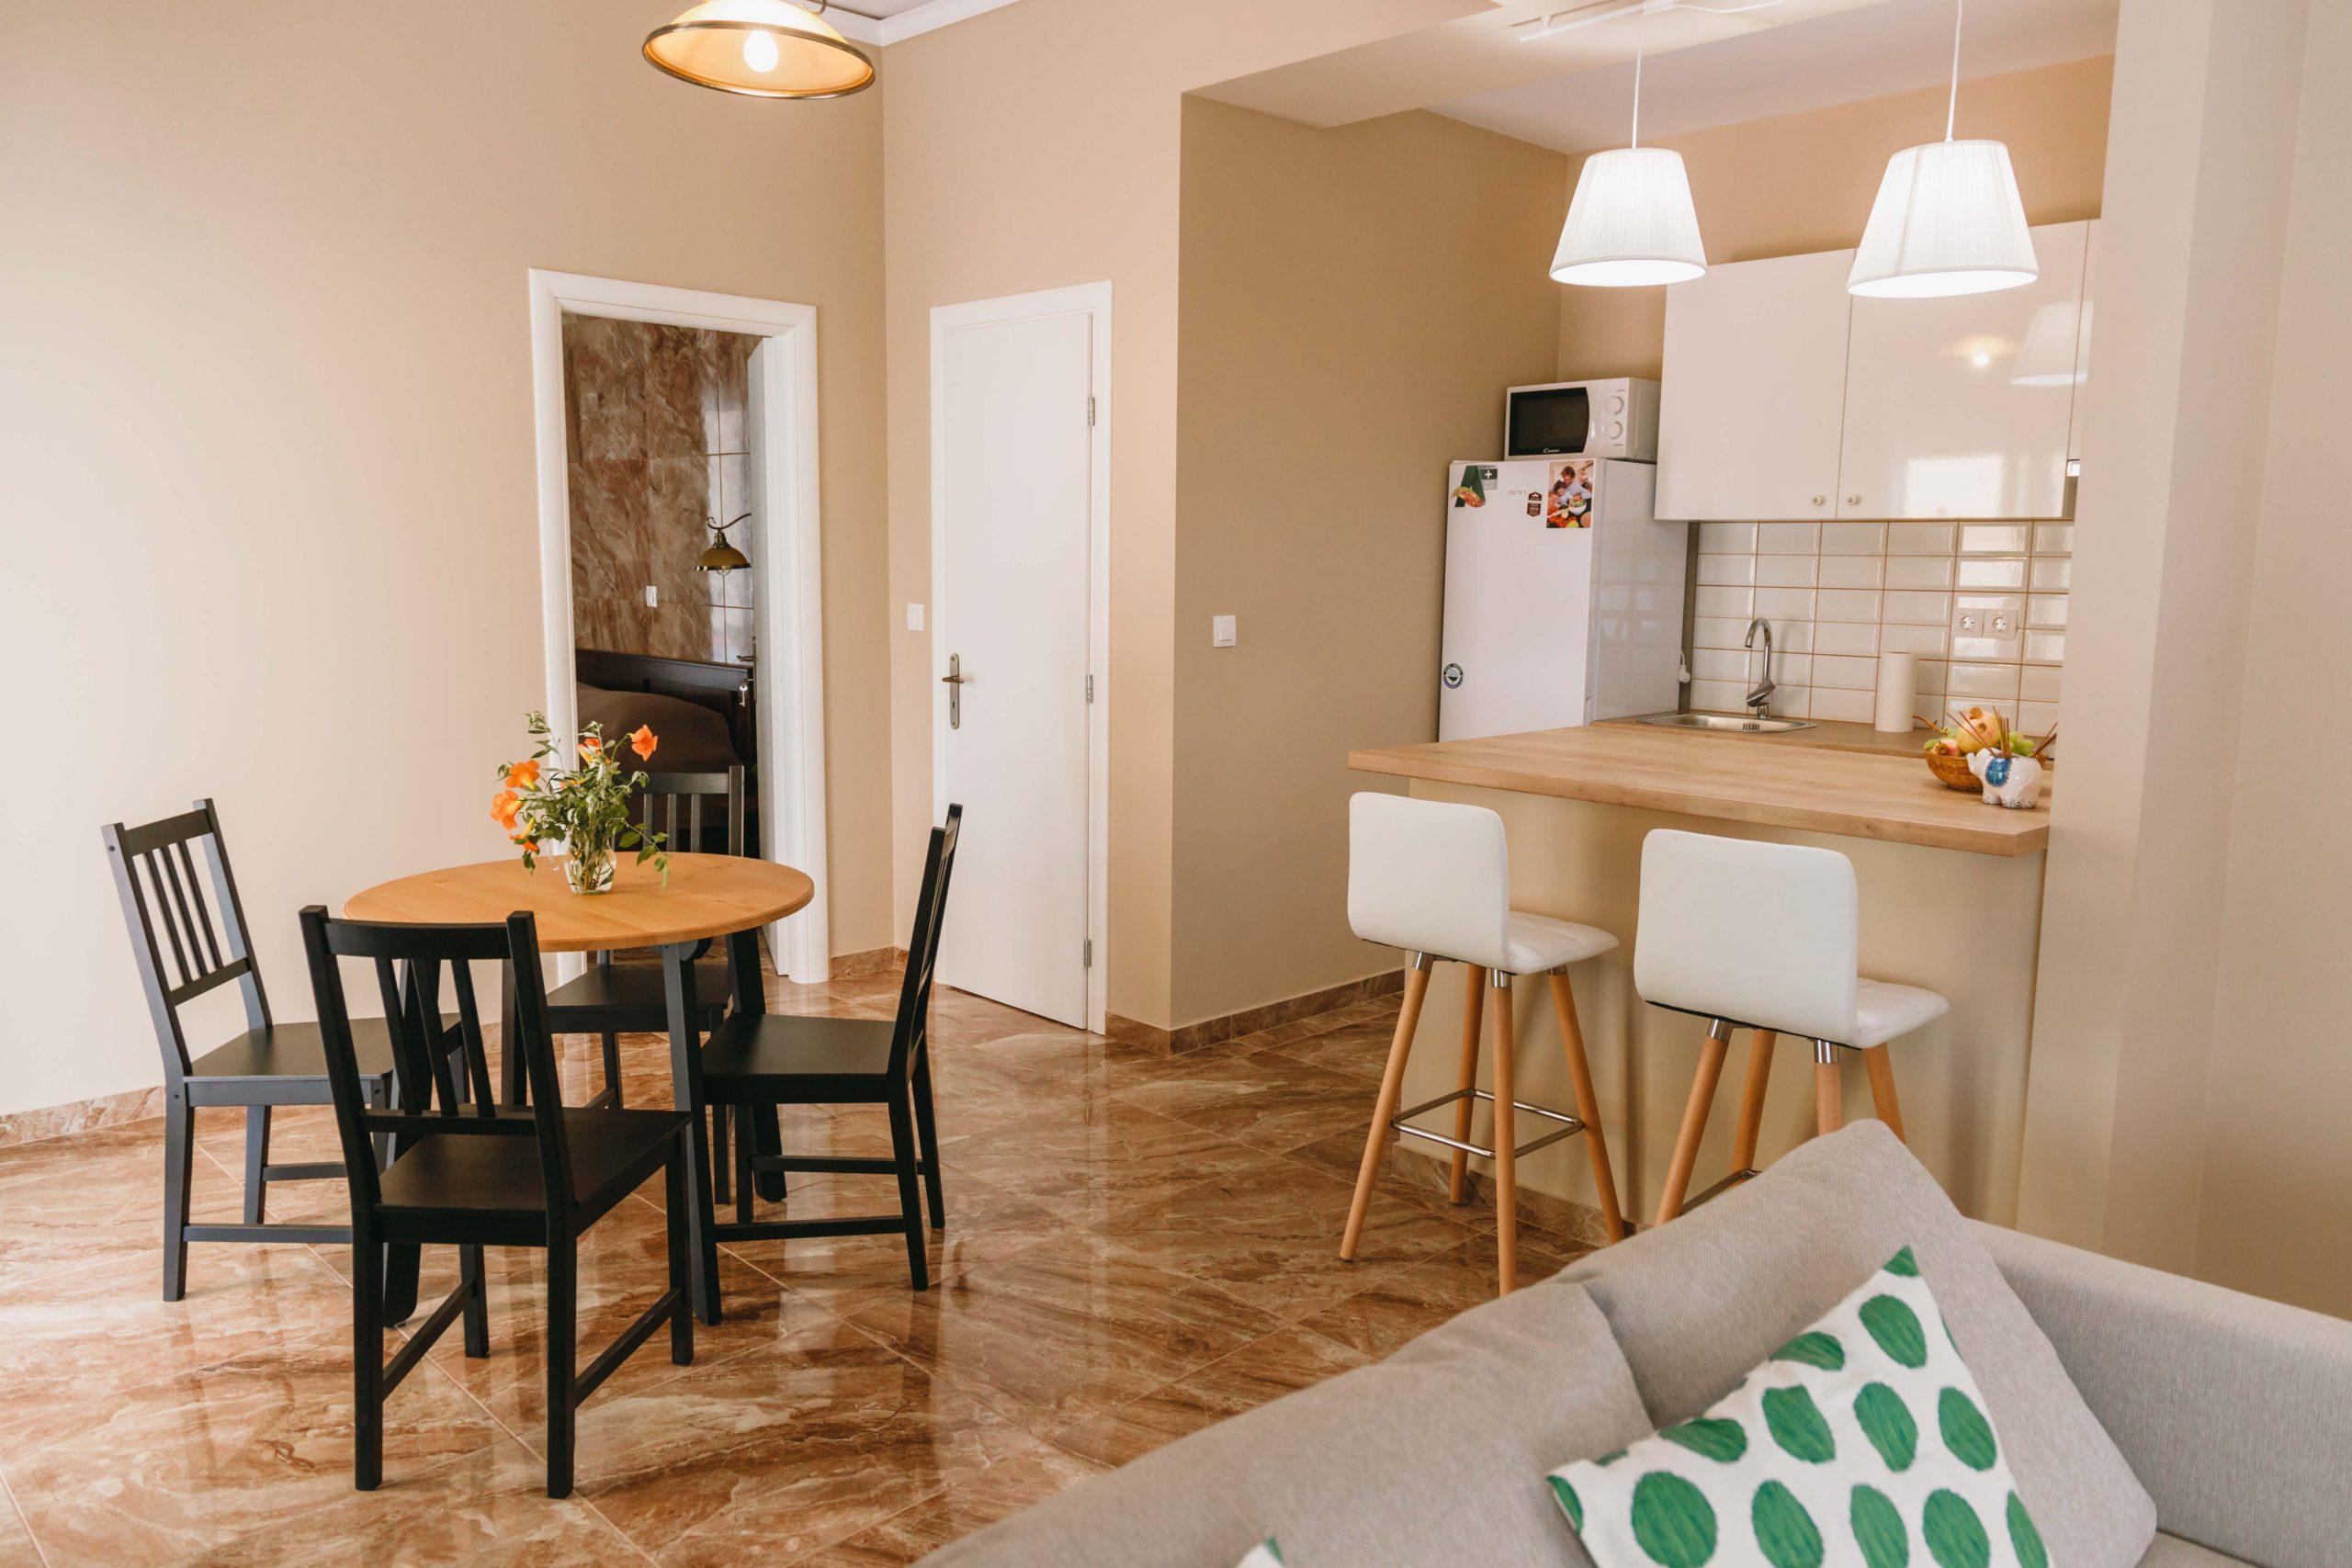 Apartment of 63sq.m in Neos Kosmos